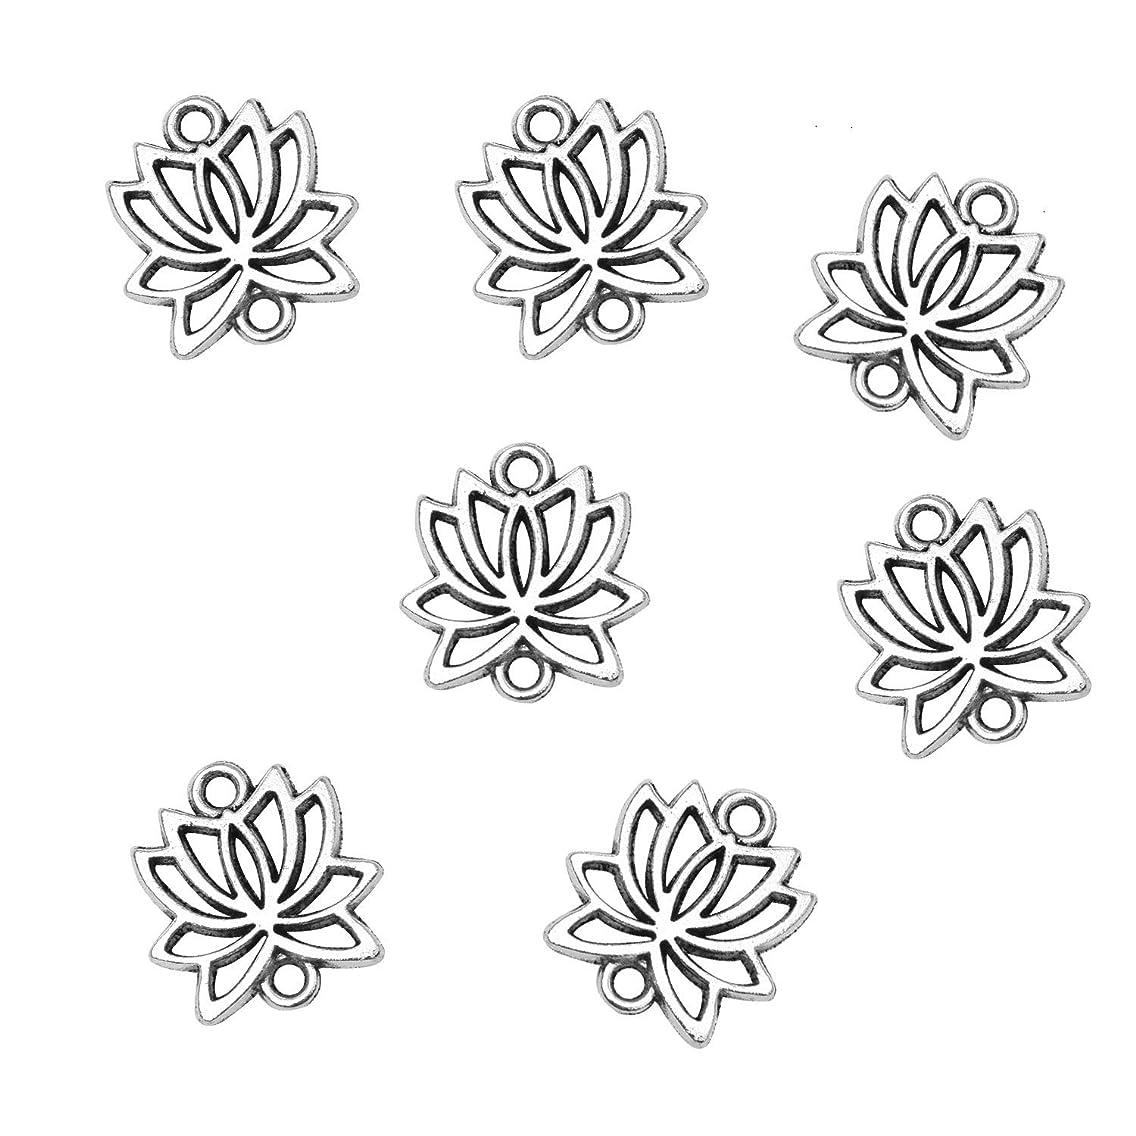 Monrocco 100 Pcs Antique Silver Tone Alloy Metal Lotus Flower Connector Charm Pendant Bulk Bracelets Charm for Jewelry Making